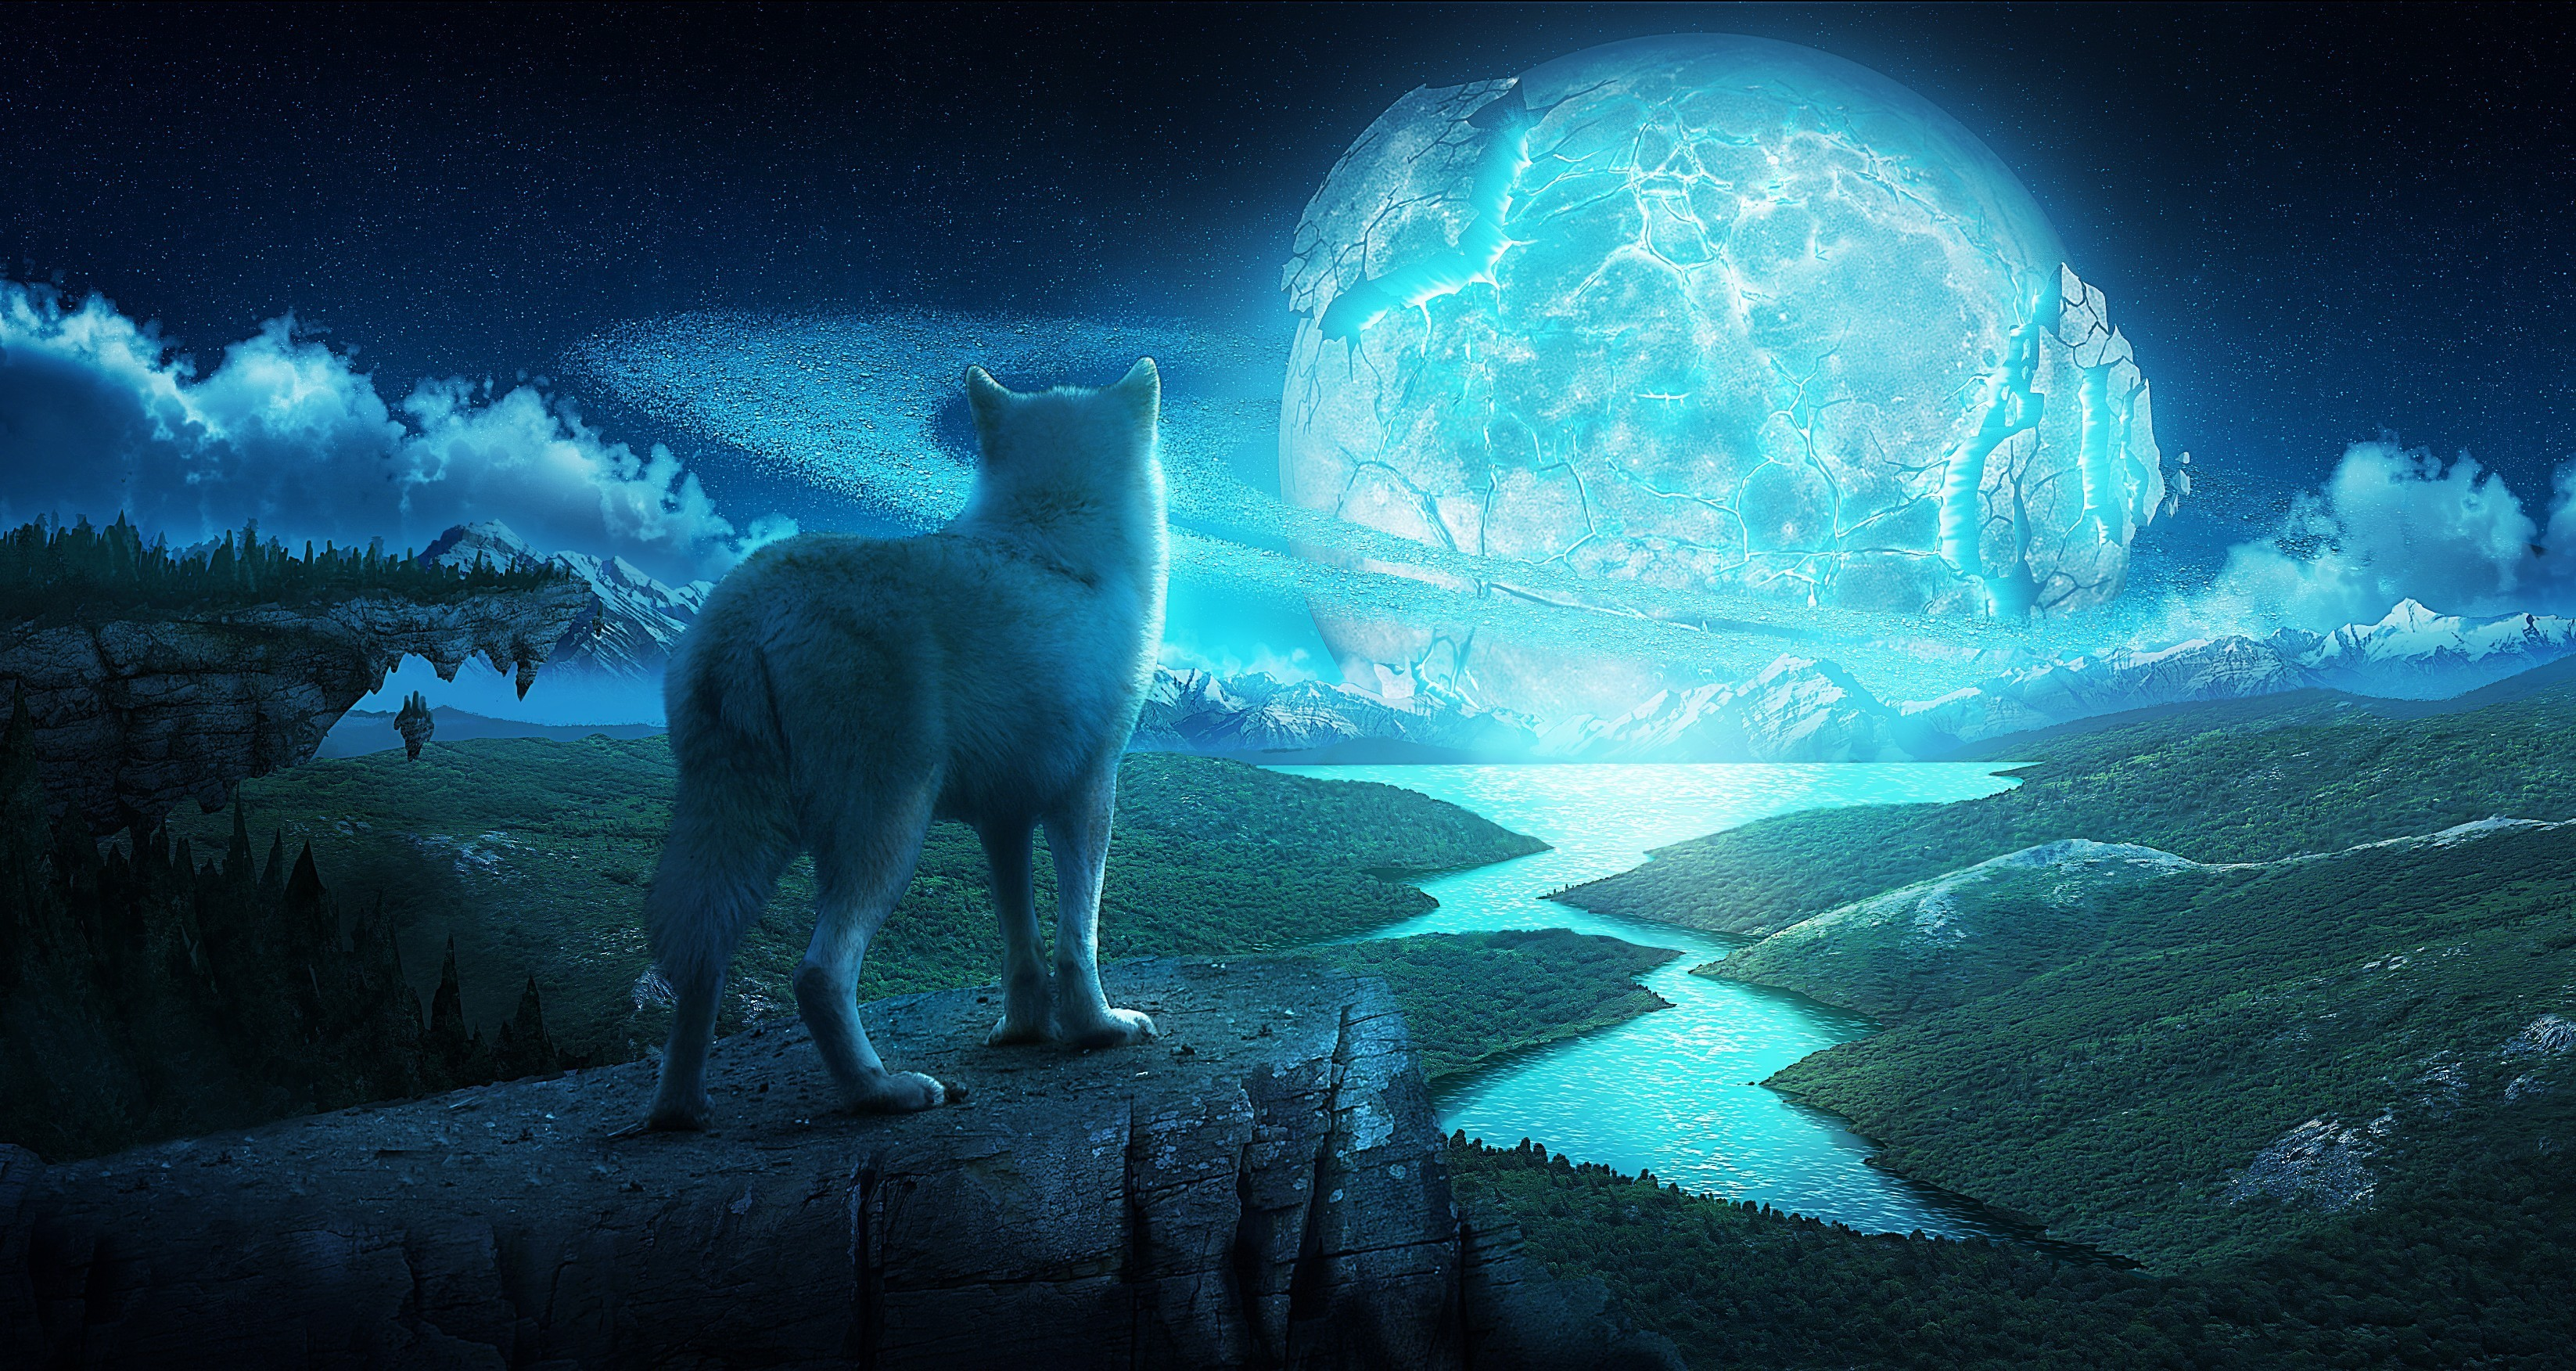 Animal Wolf Landscape River Magical Sun Planetscape Fantasy Wallpaper: wall.alphacoders.com/big.php?i=303917